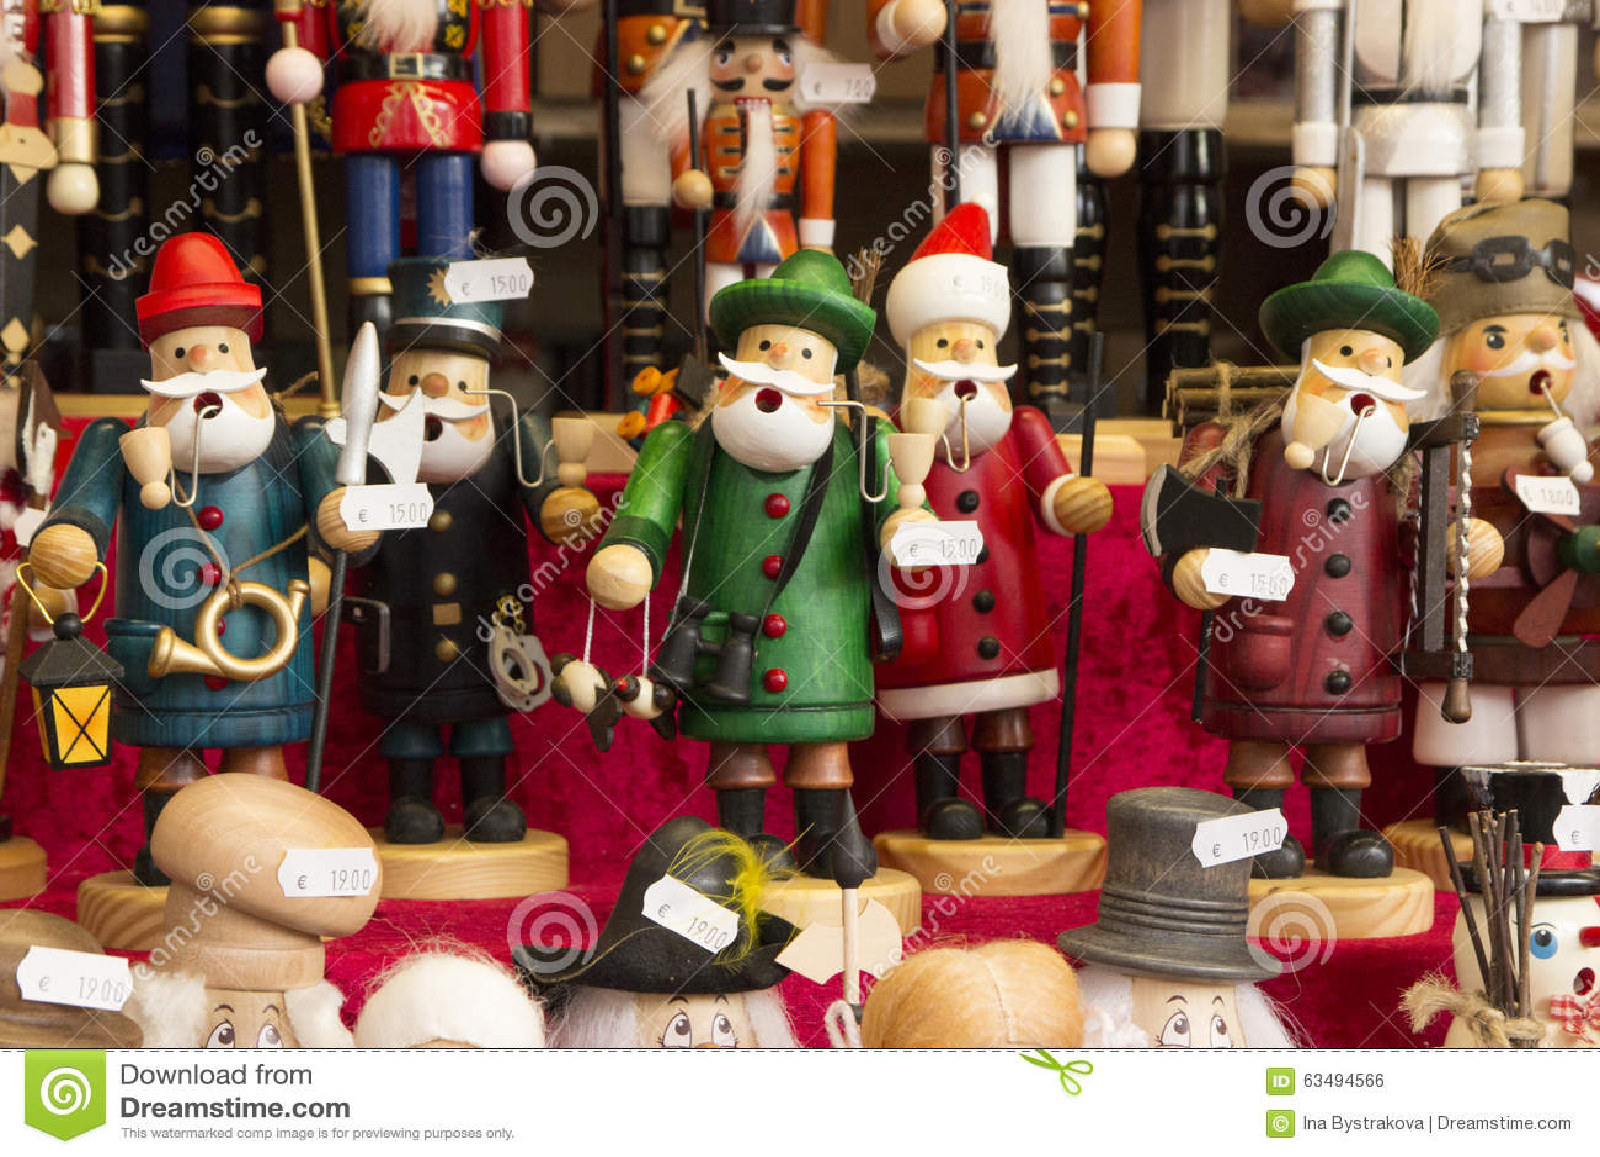 traditional christmas market souvenirs stock photo - image